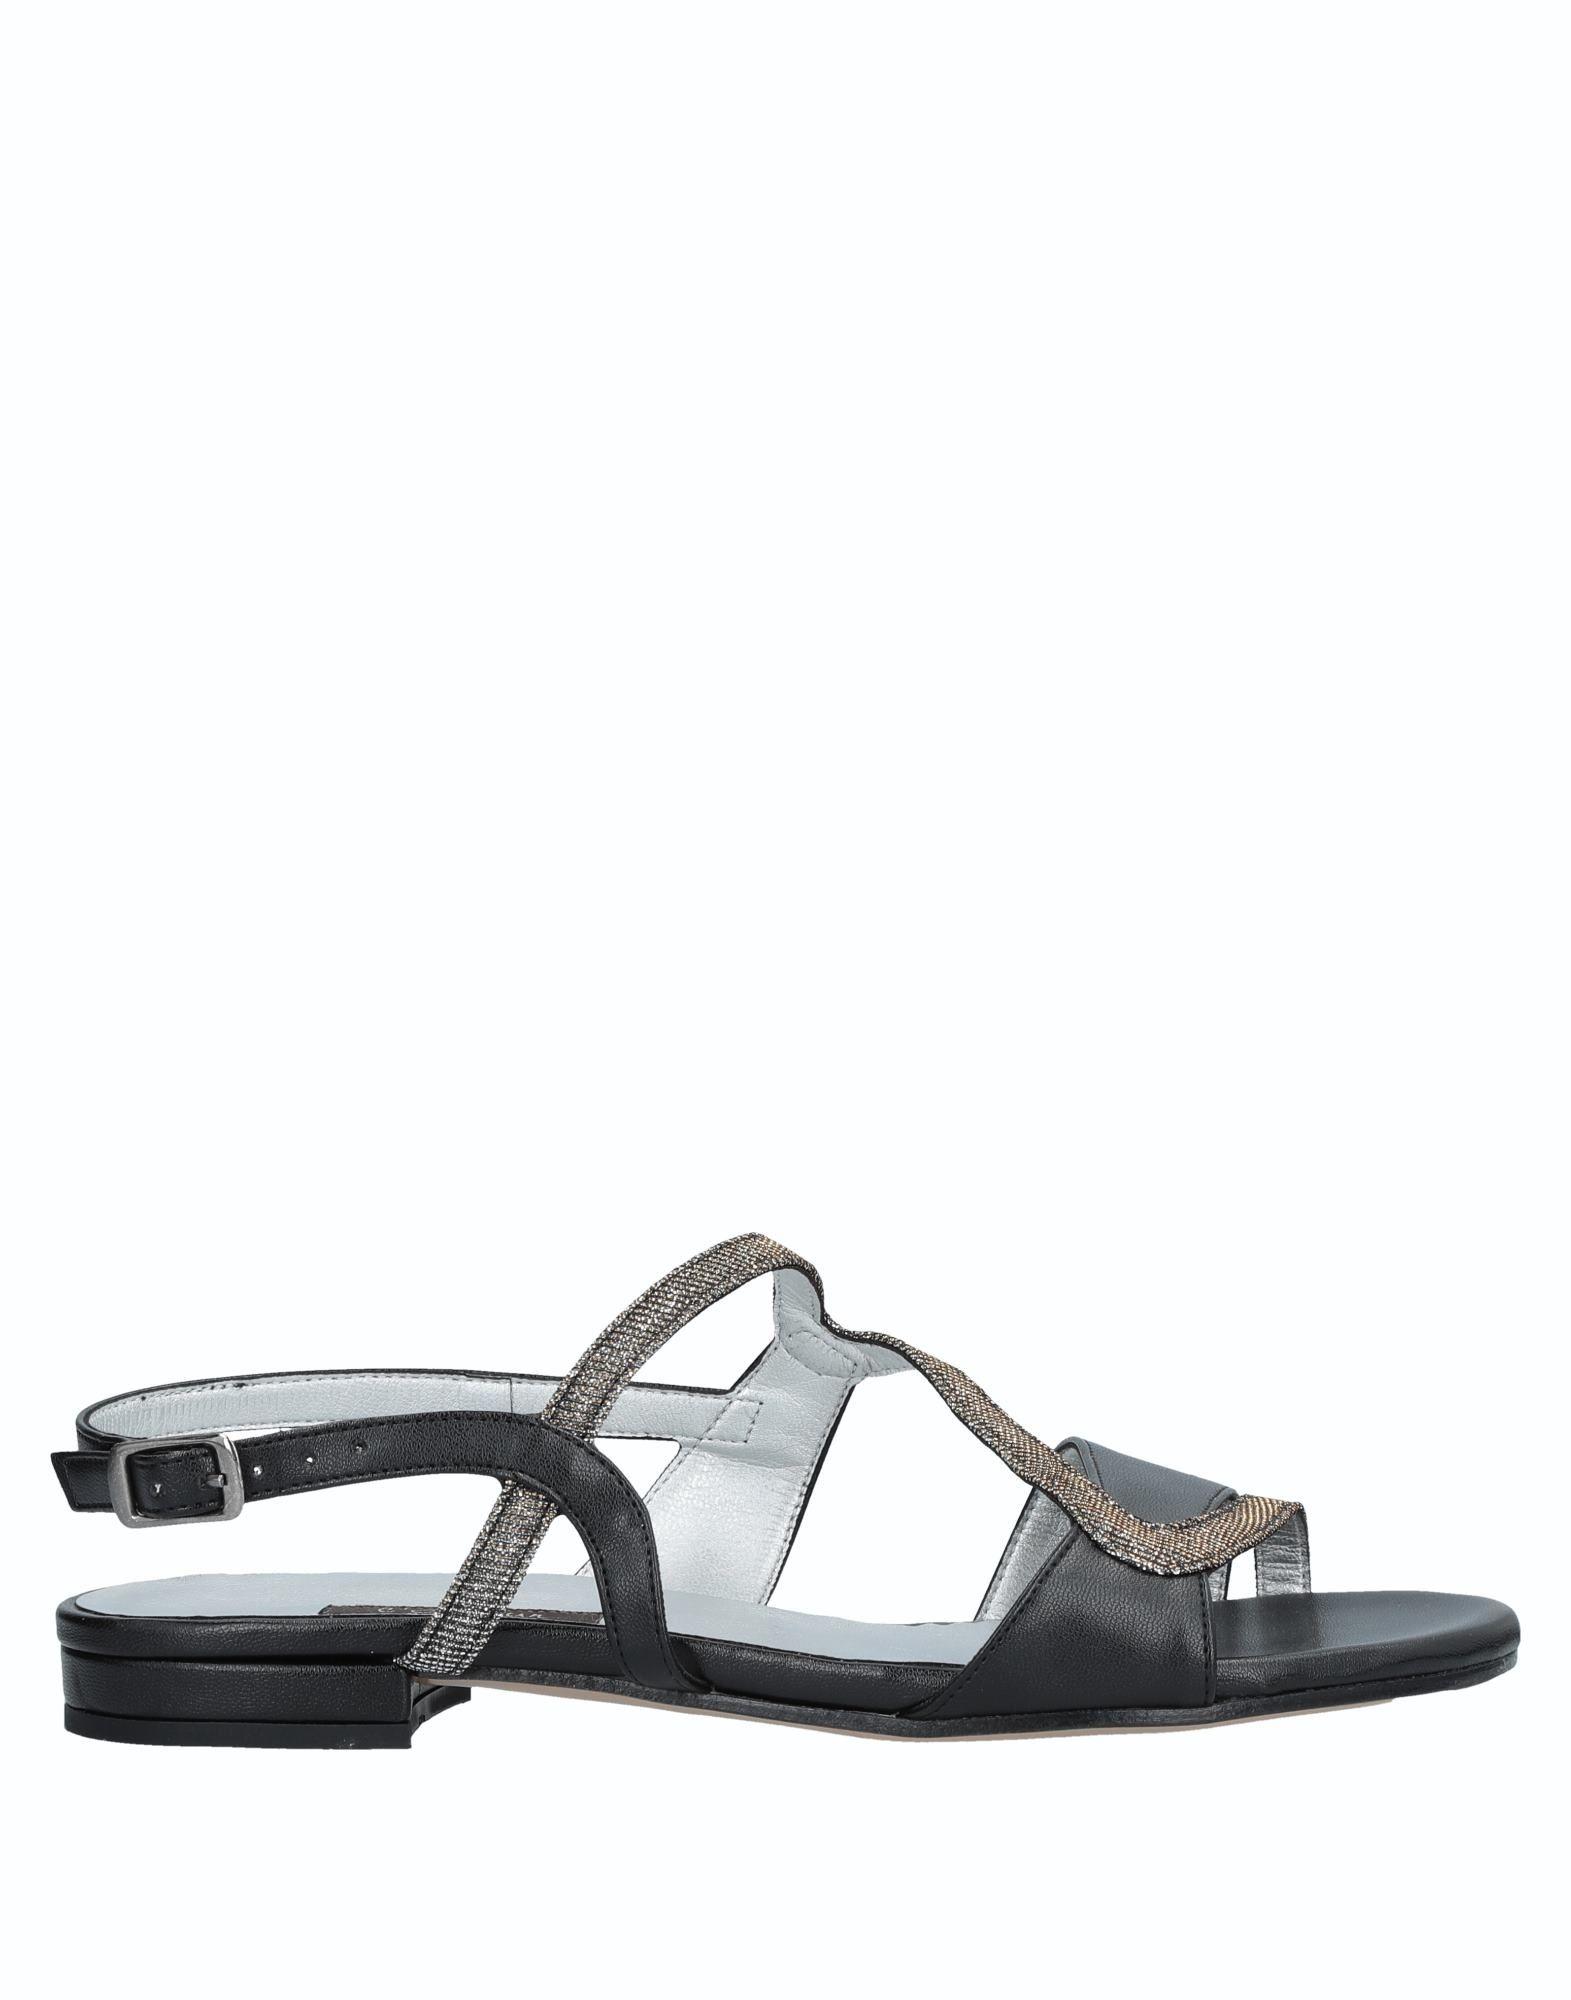 Haltbare Mode billige Schuhe L'amour Sandalen Damen  11537311RD Heiße Schuhe